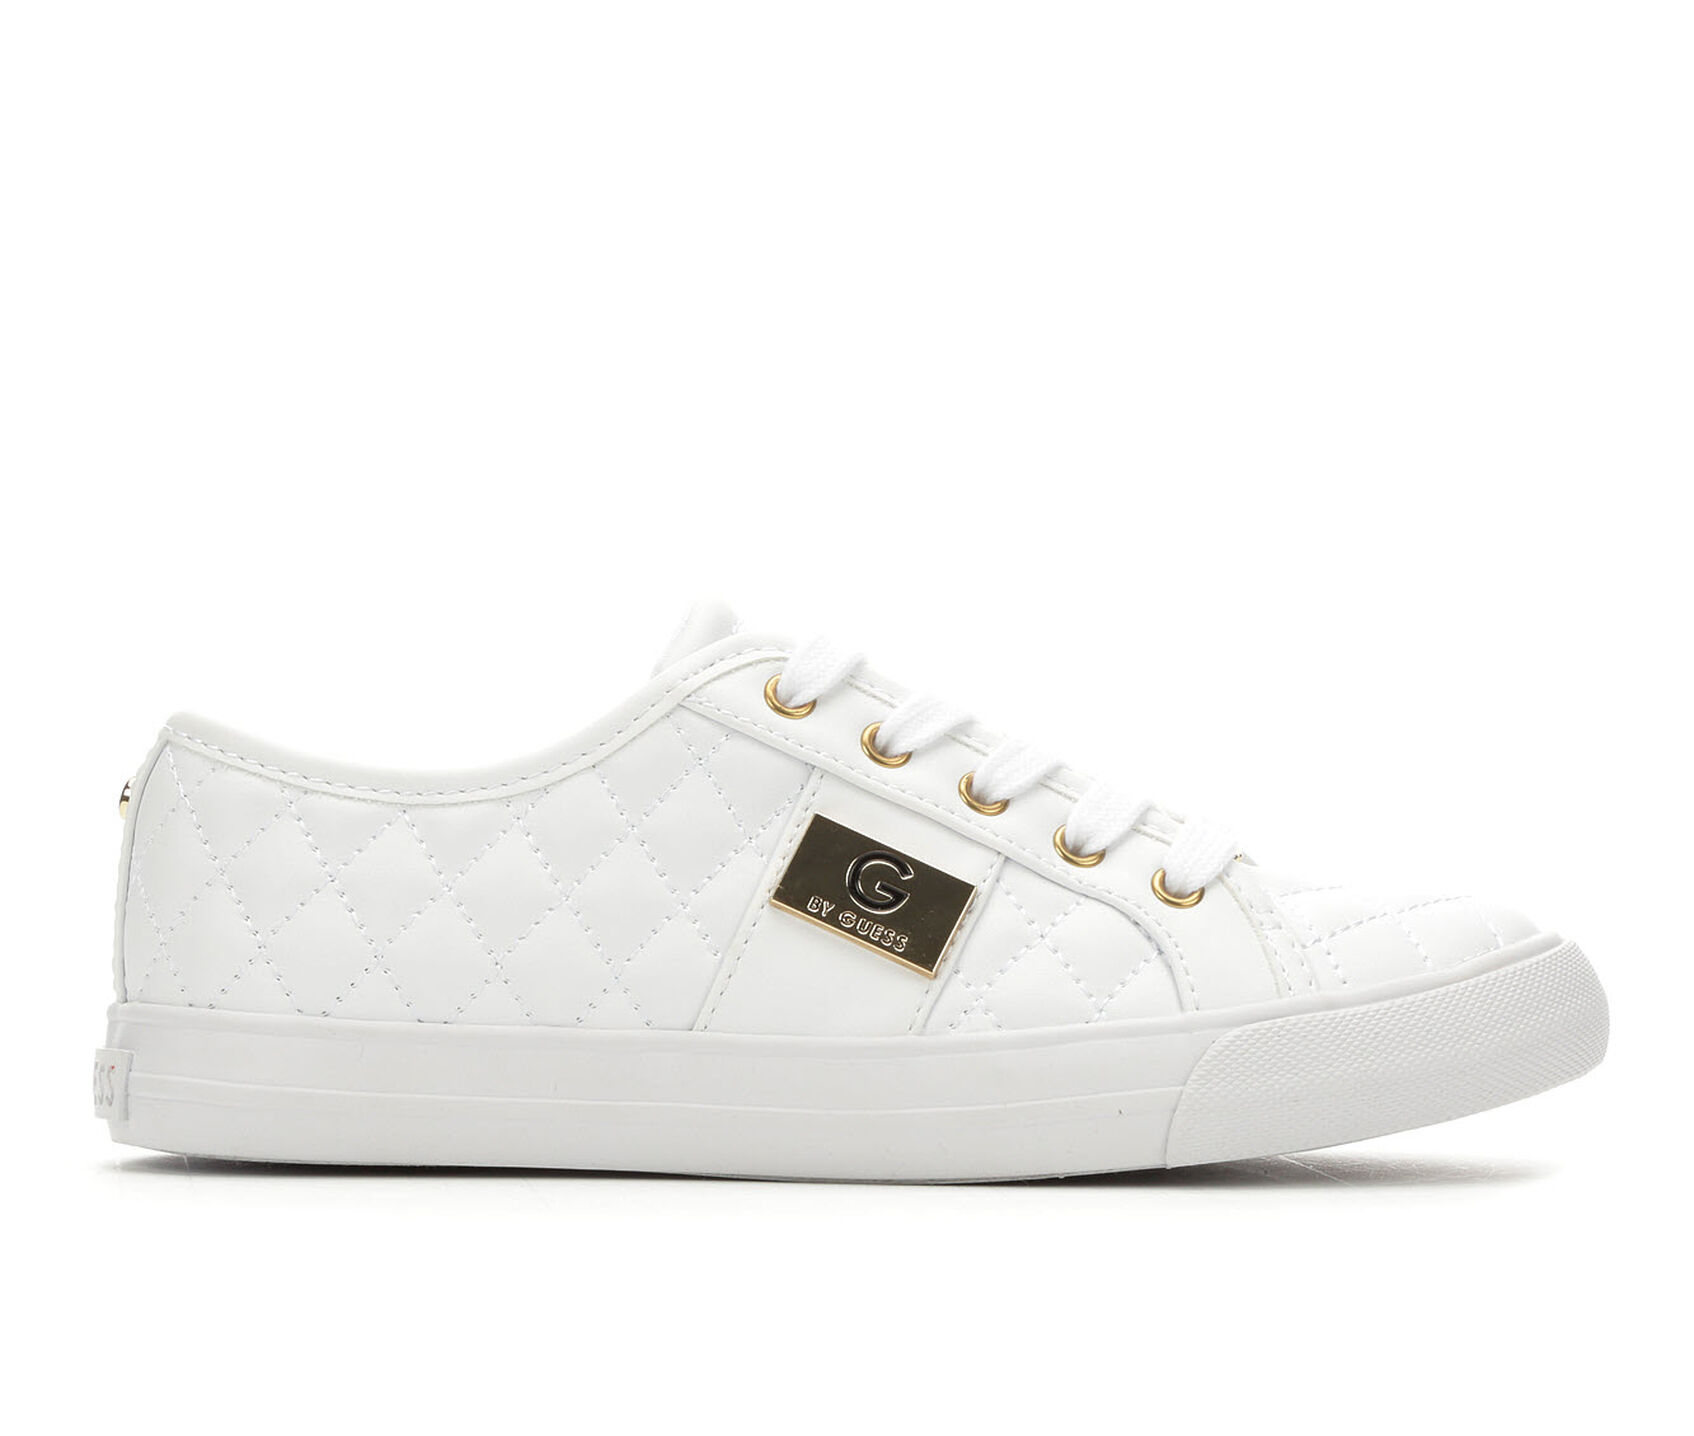 52821630c7a5 Women s G By Guess Backer Sneakers